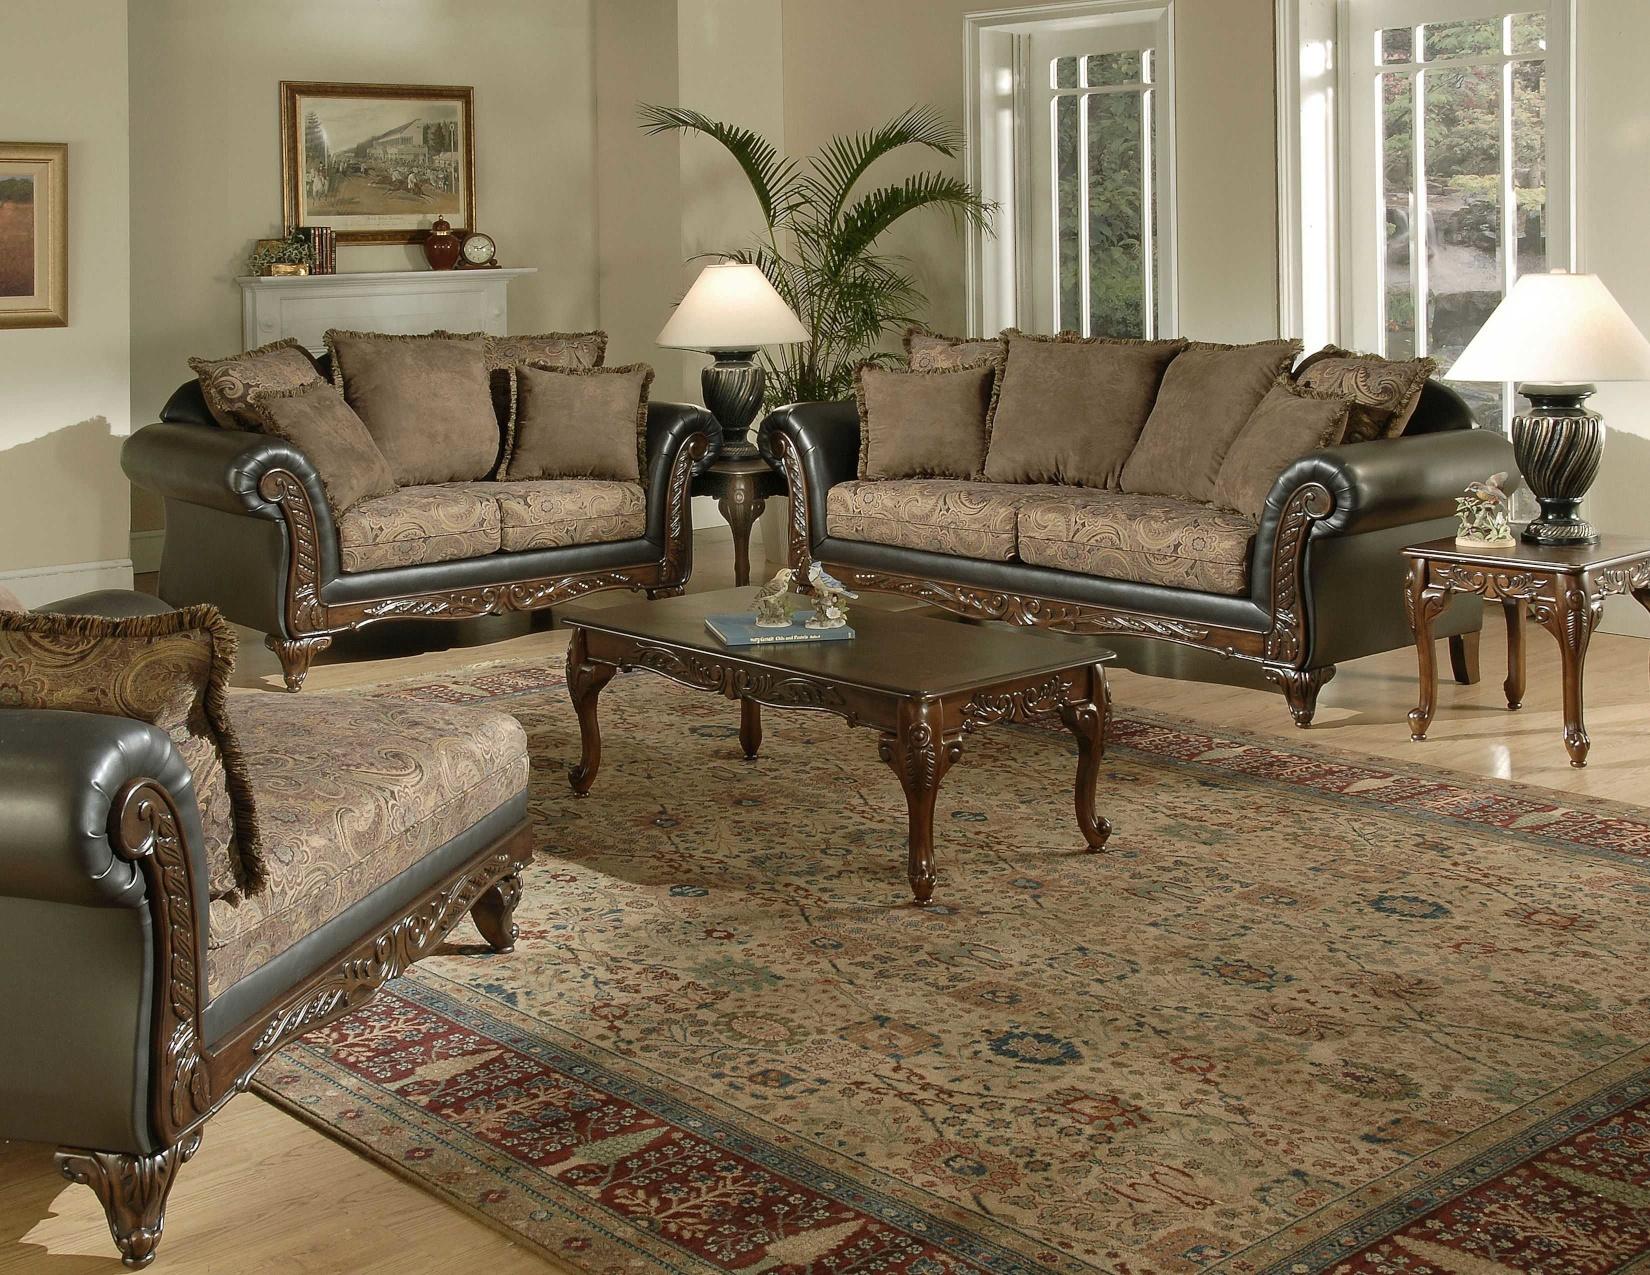 Union Furniture living room set leather